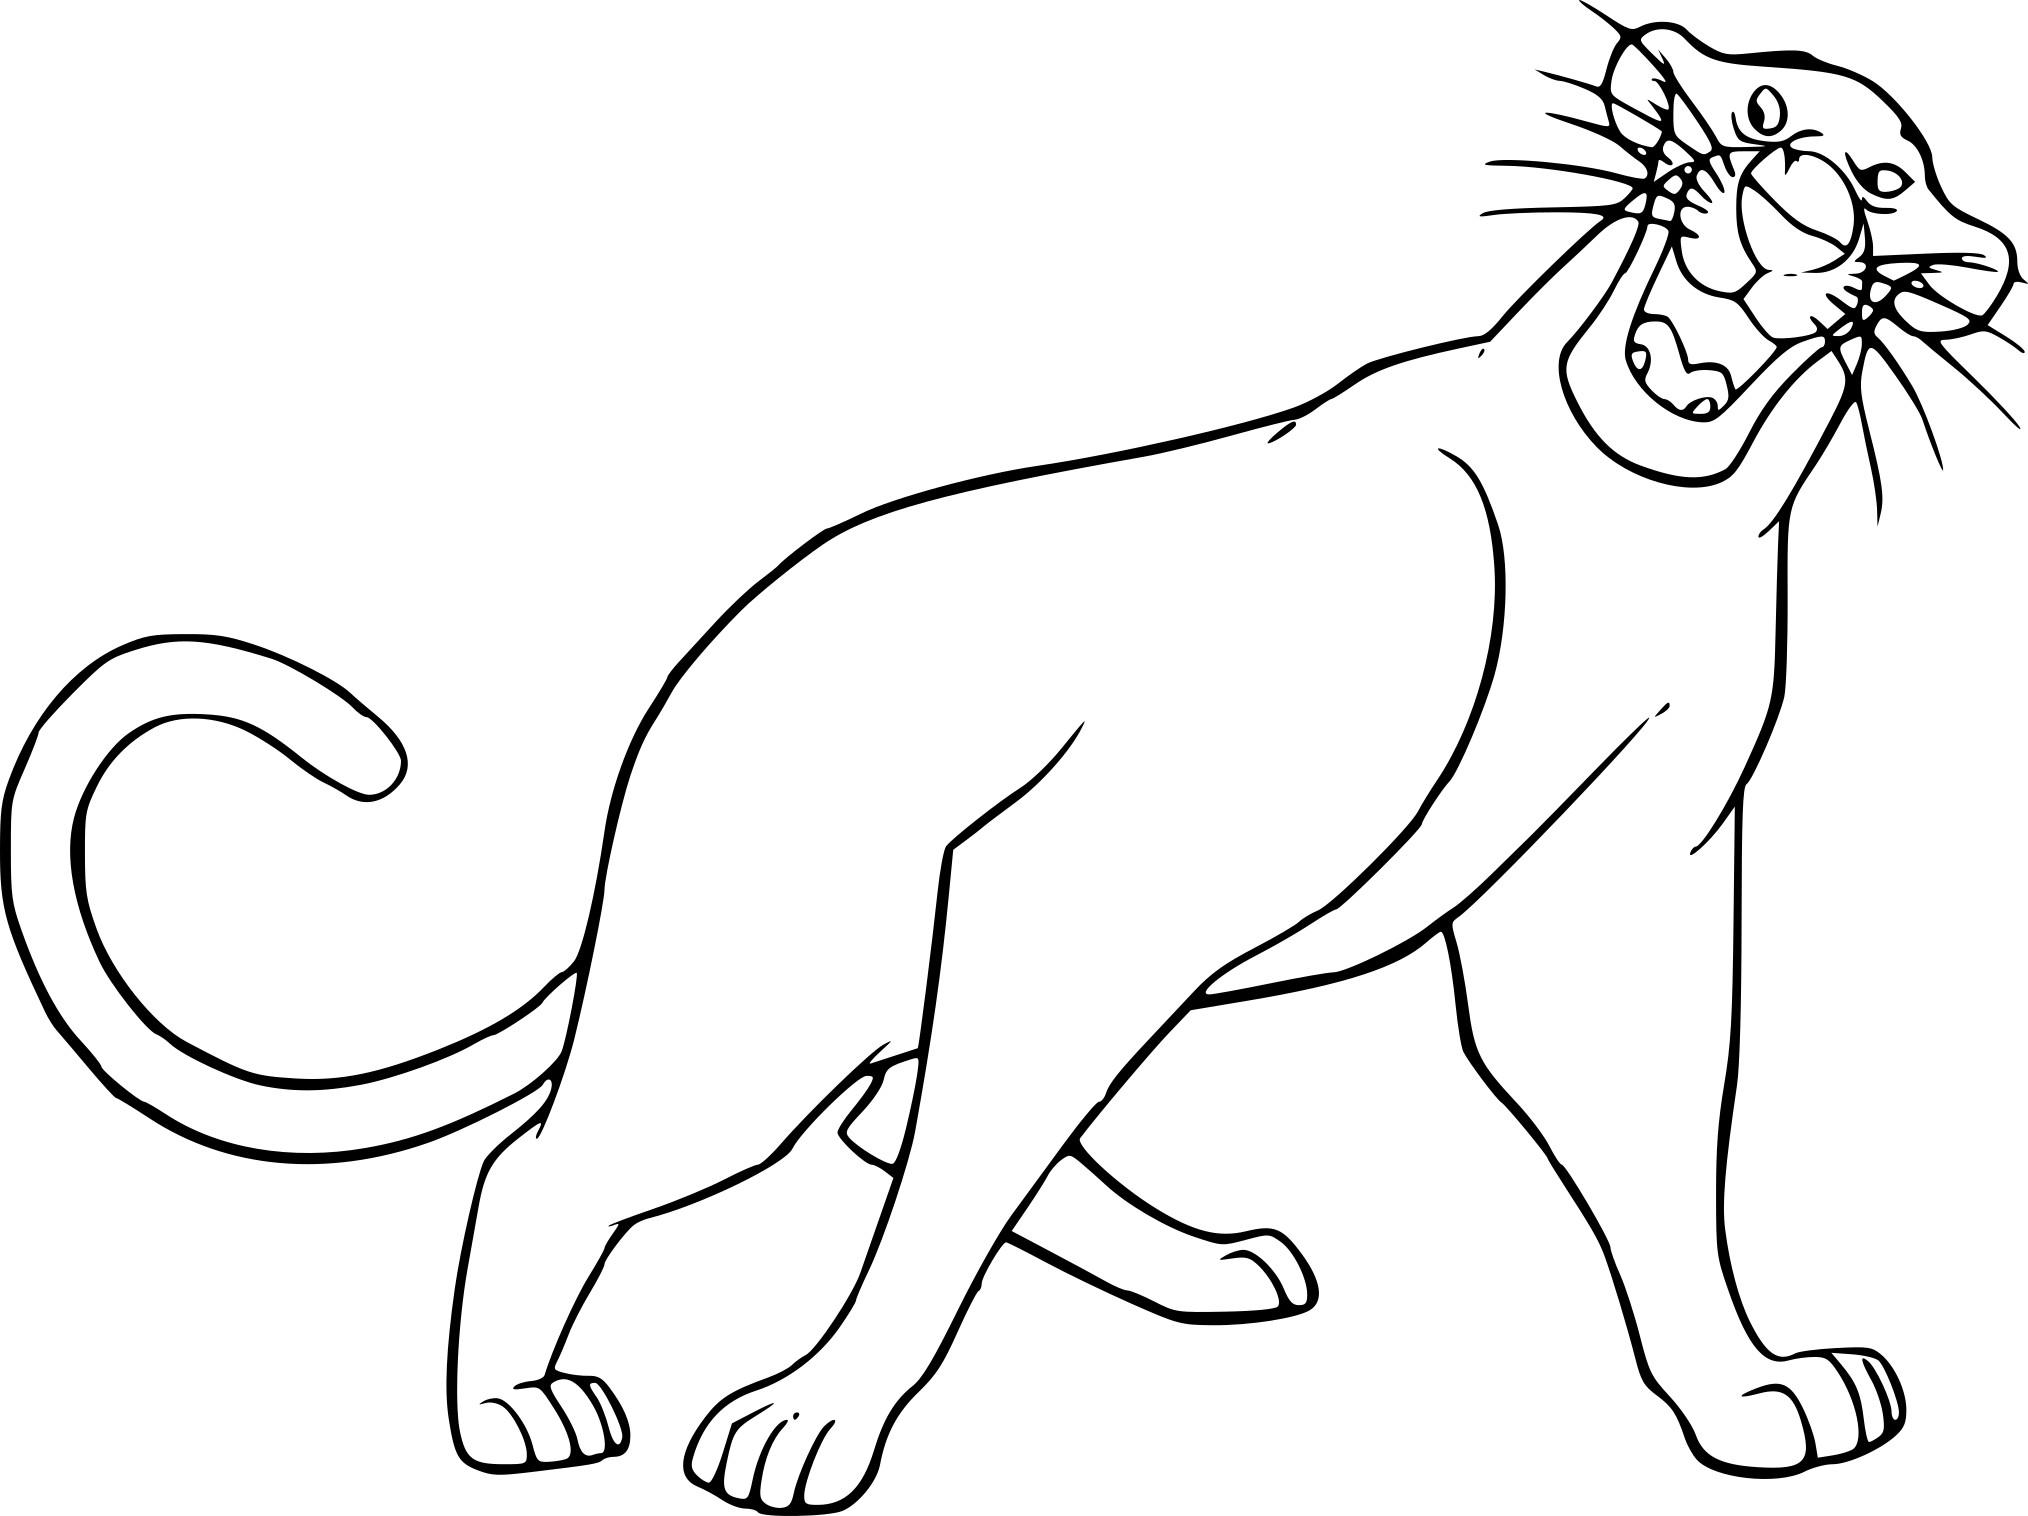 Coloriage Panthere Bagheera A Imprimer